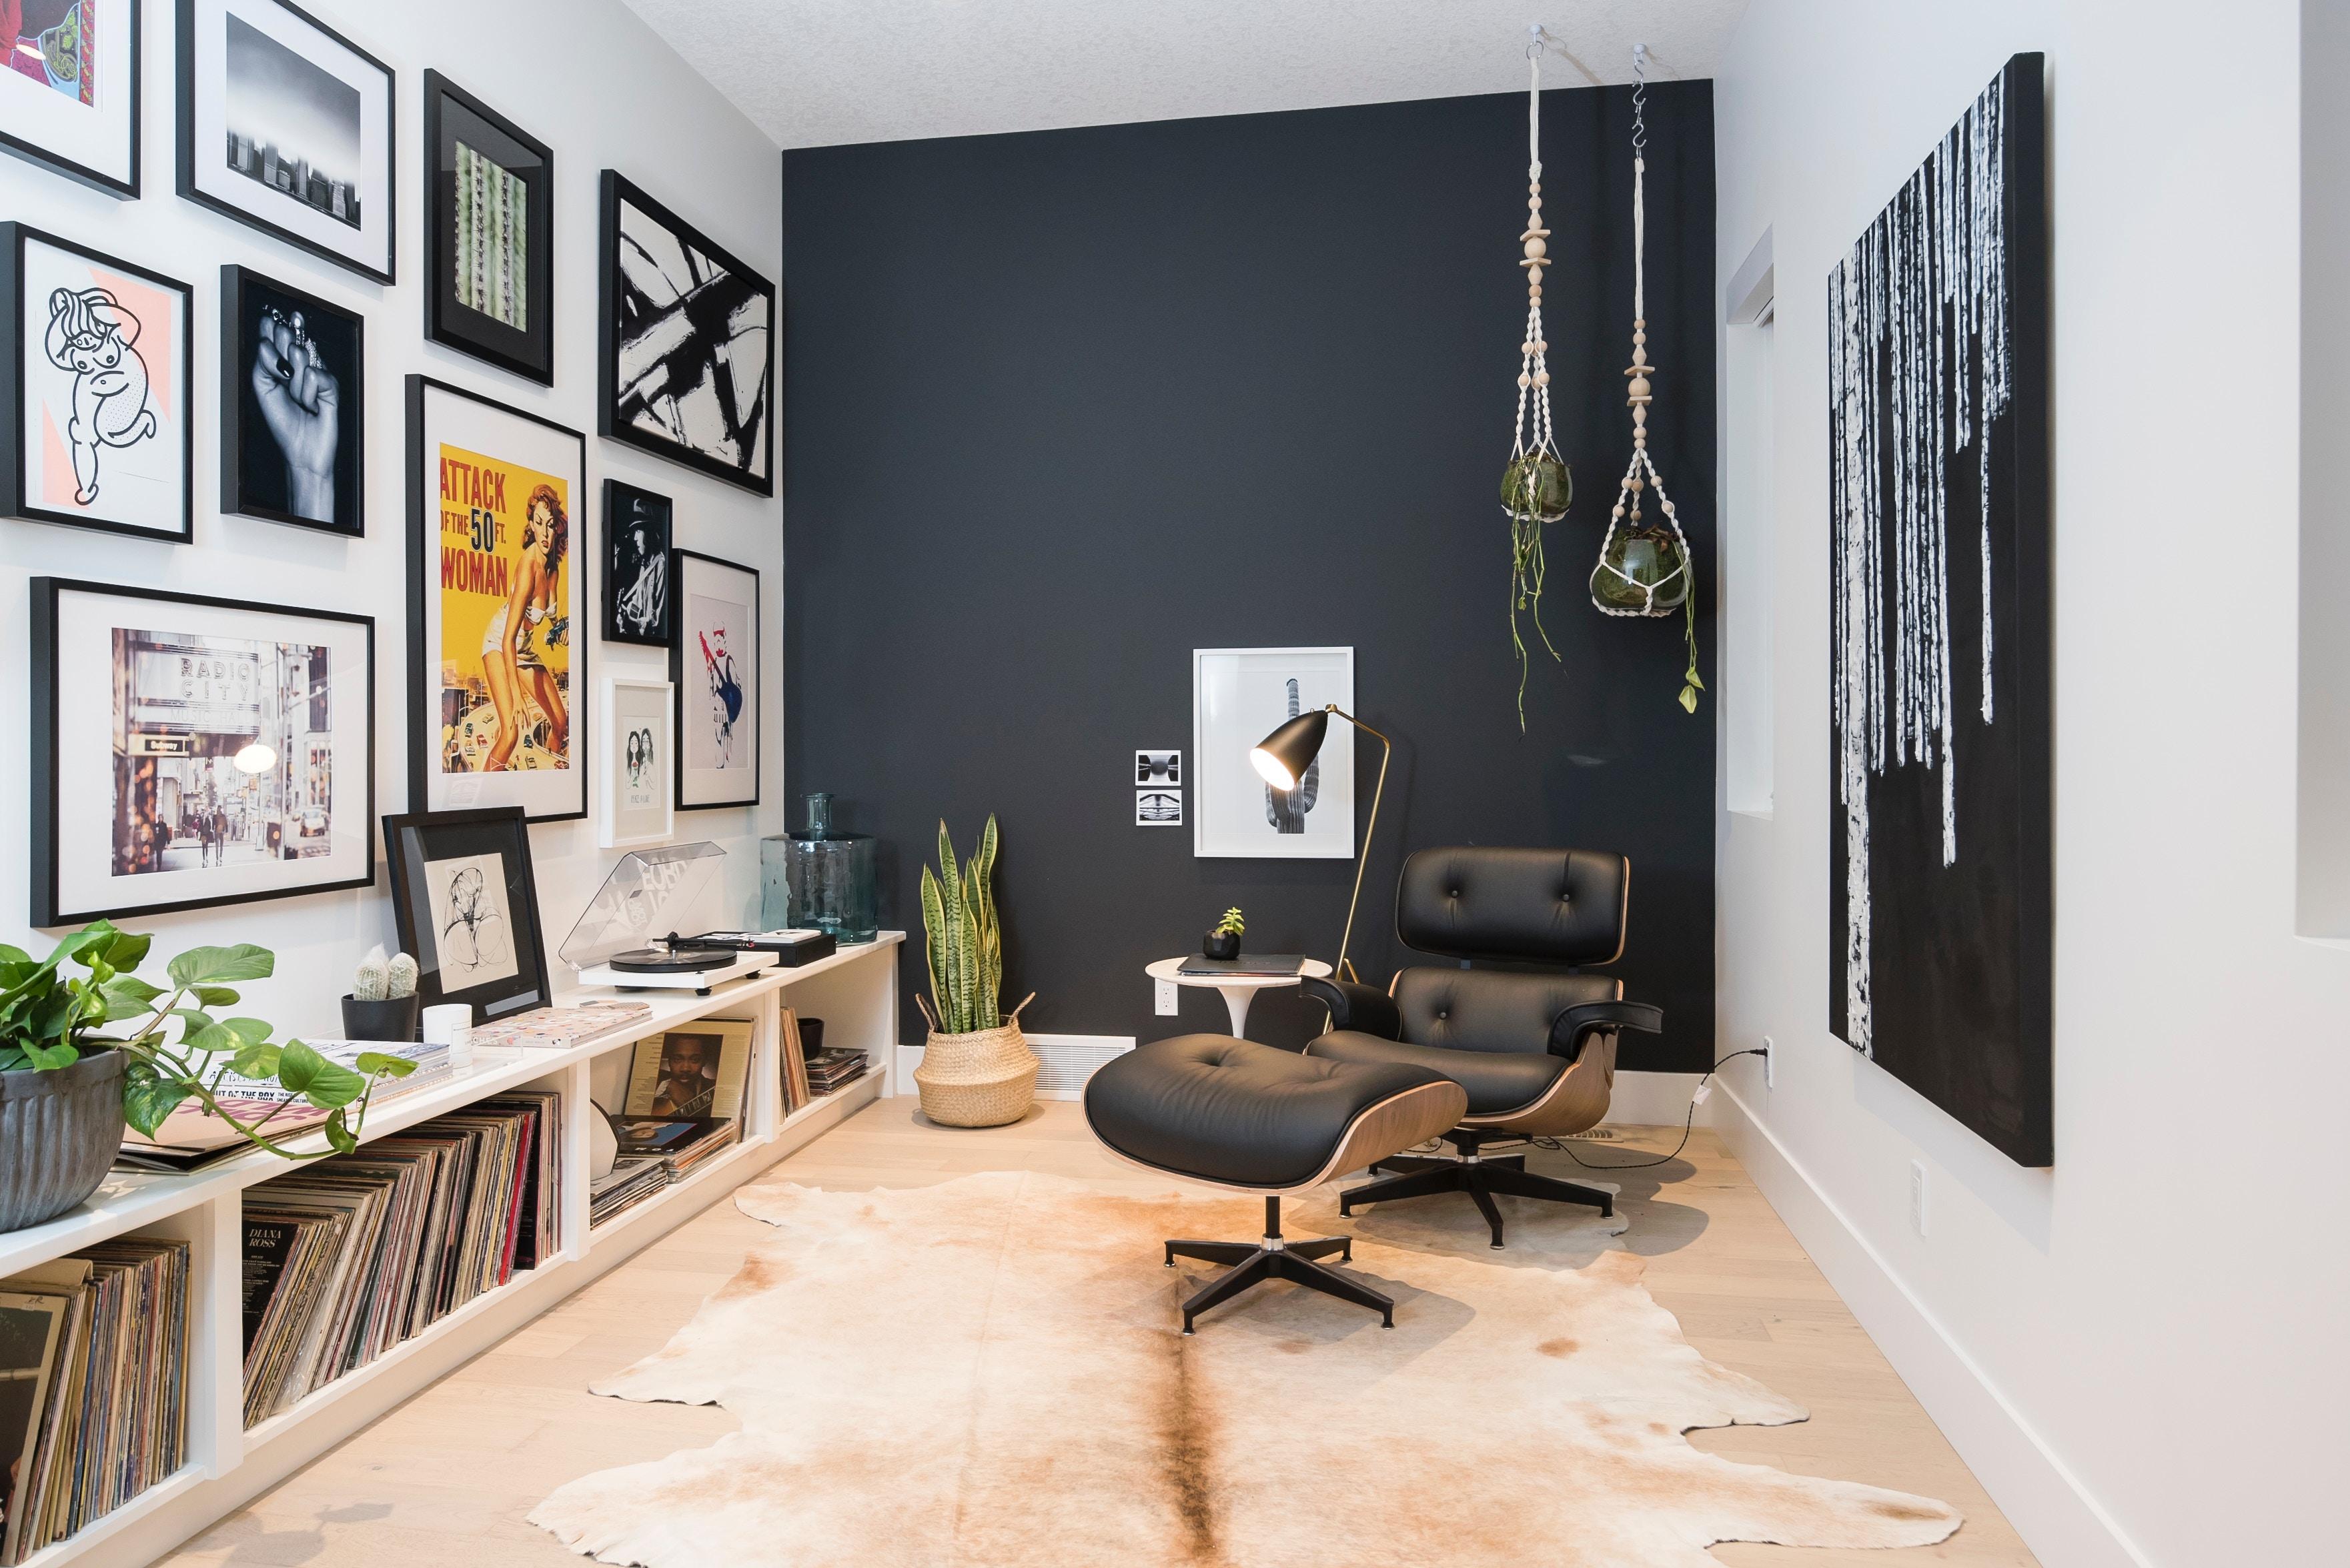 Poltrona Lounge Base de Alumínio Charles Eames com Puff